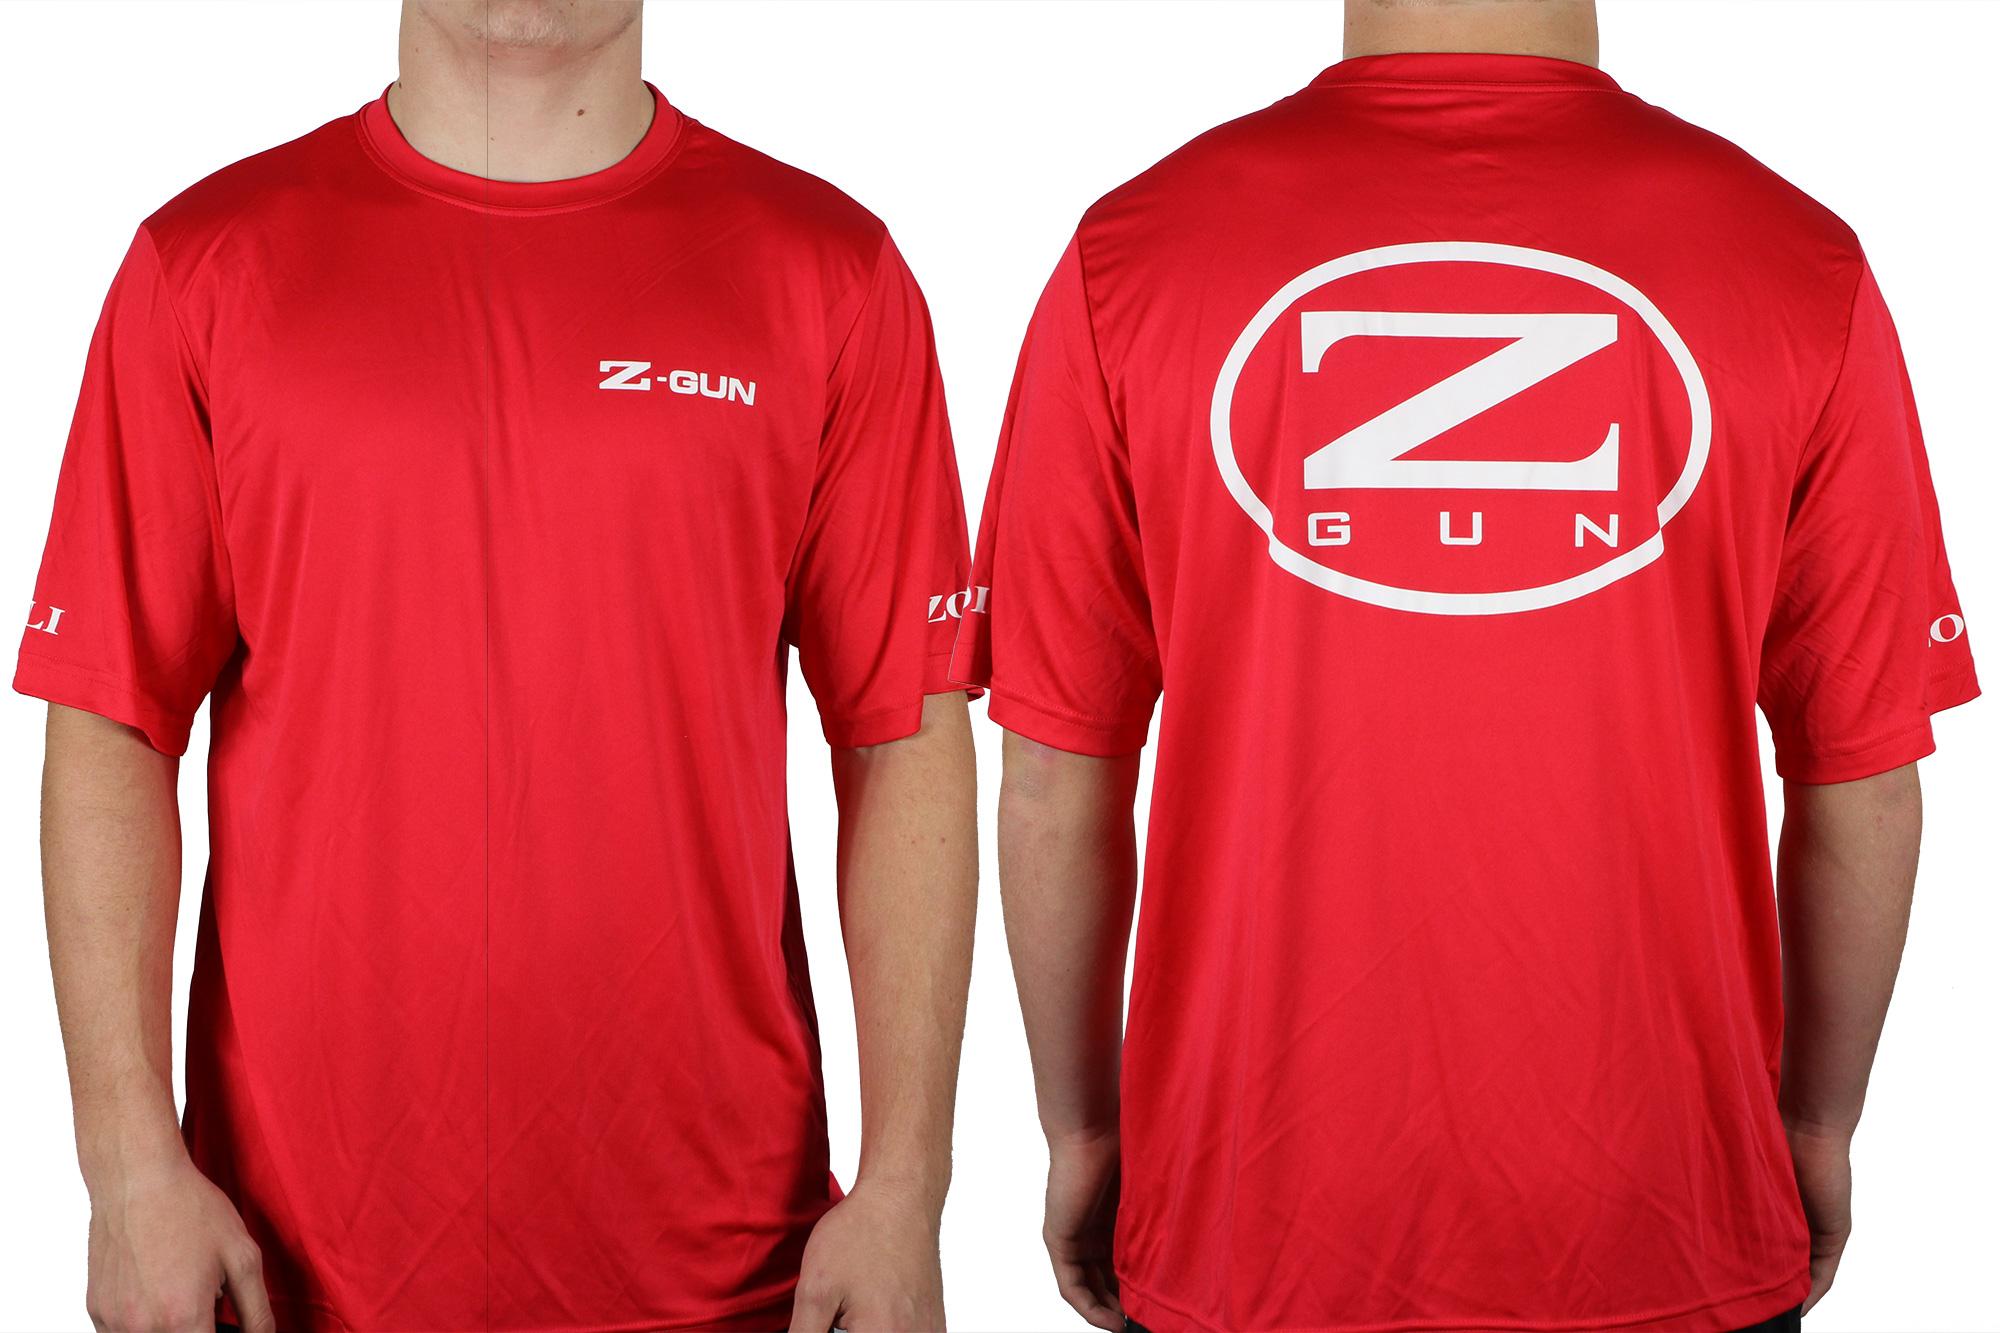 Zoli Z-GUN Red Sport Shirt